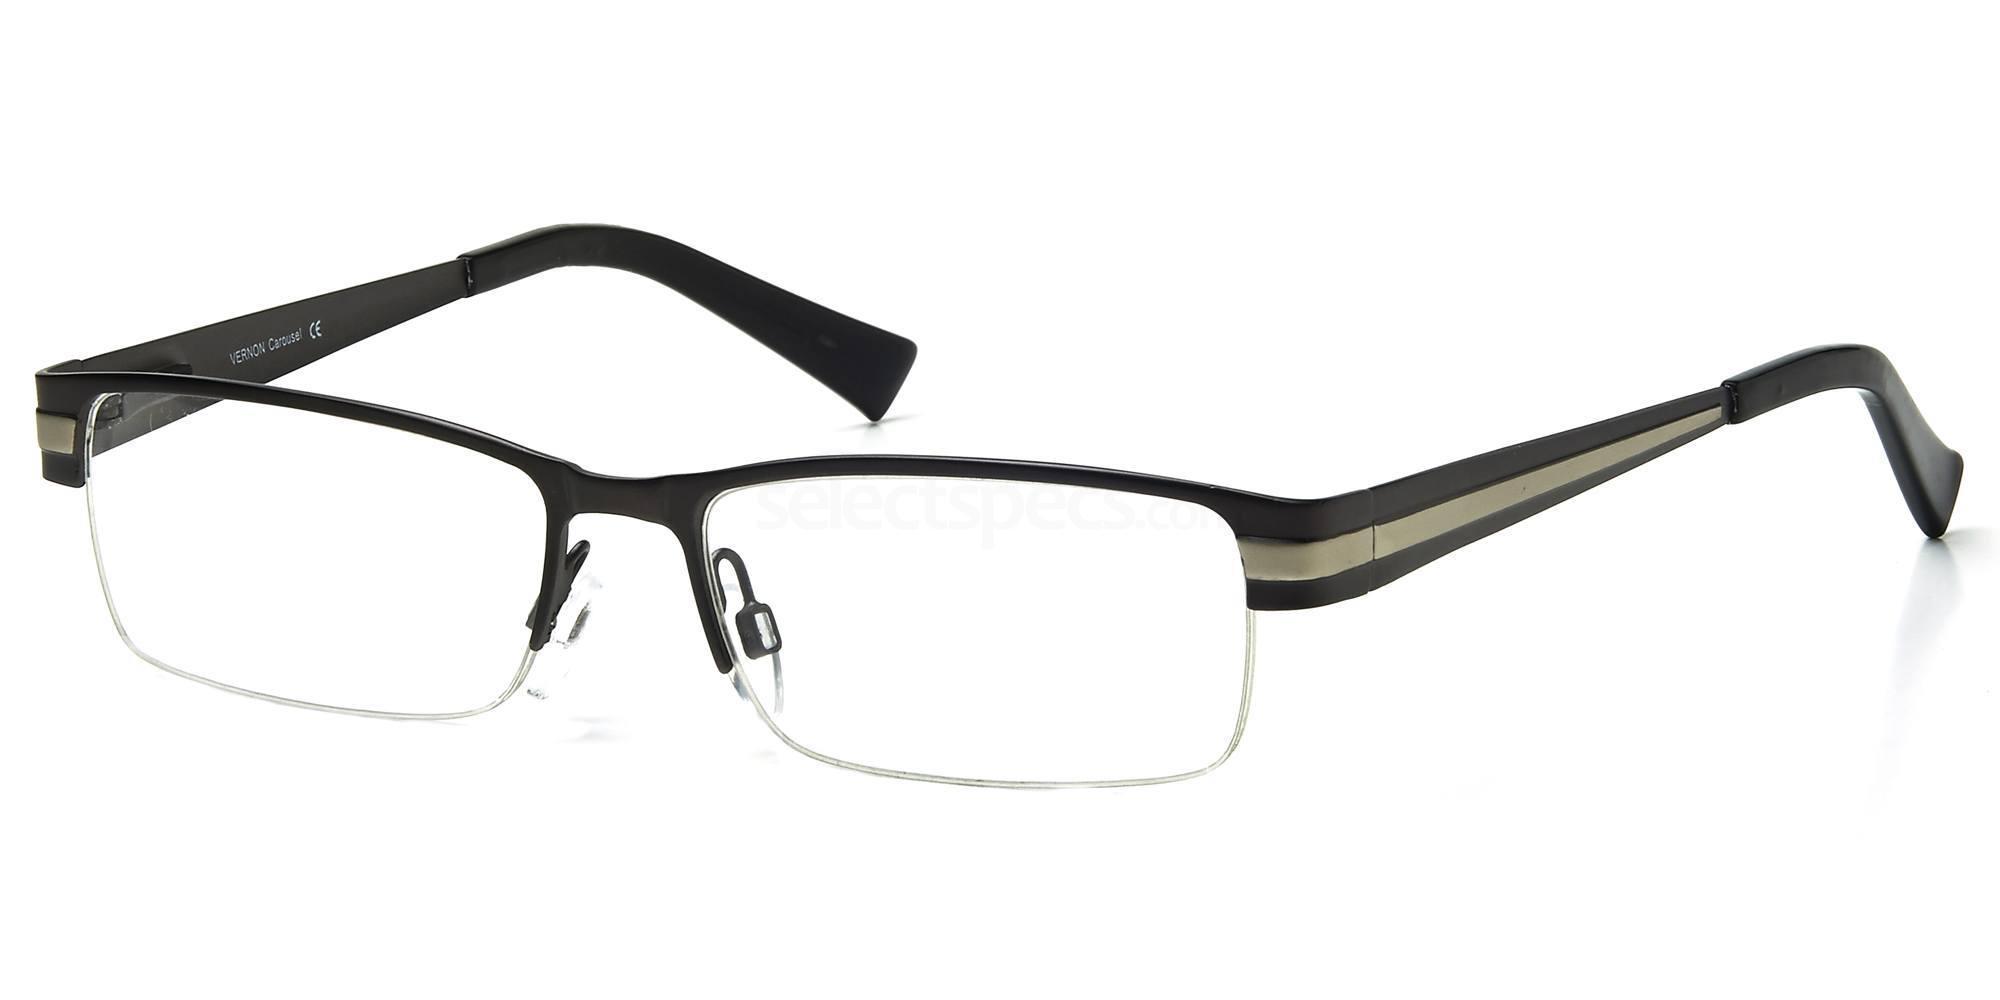 C1 VERNON Glasses, Carousel +